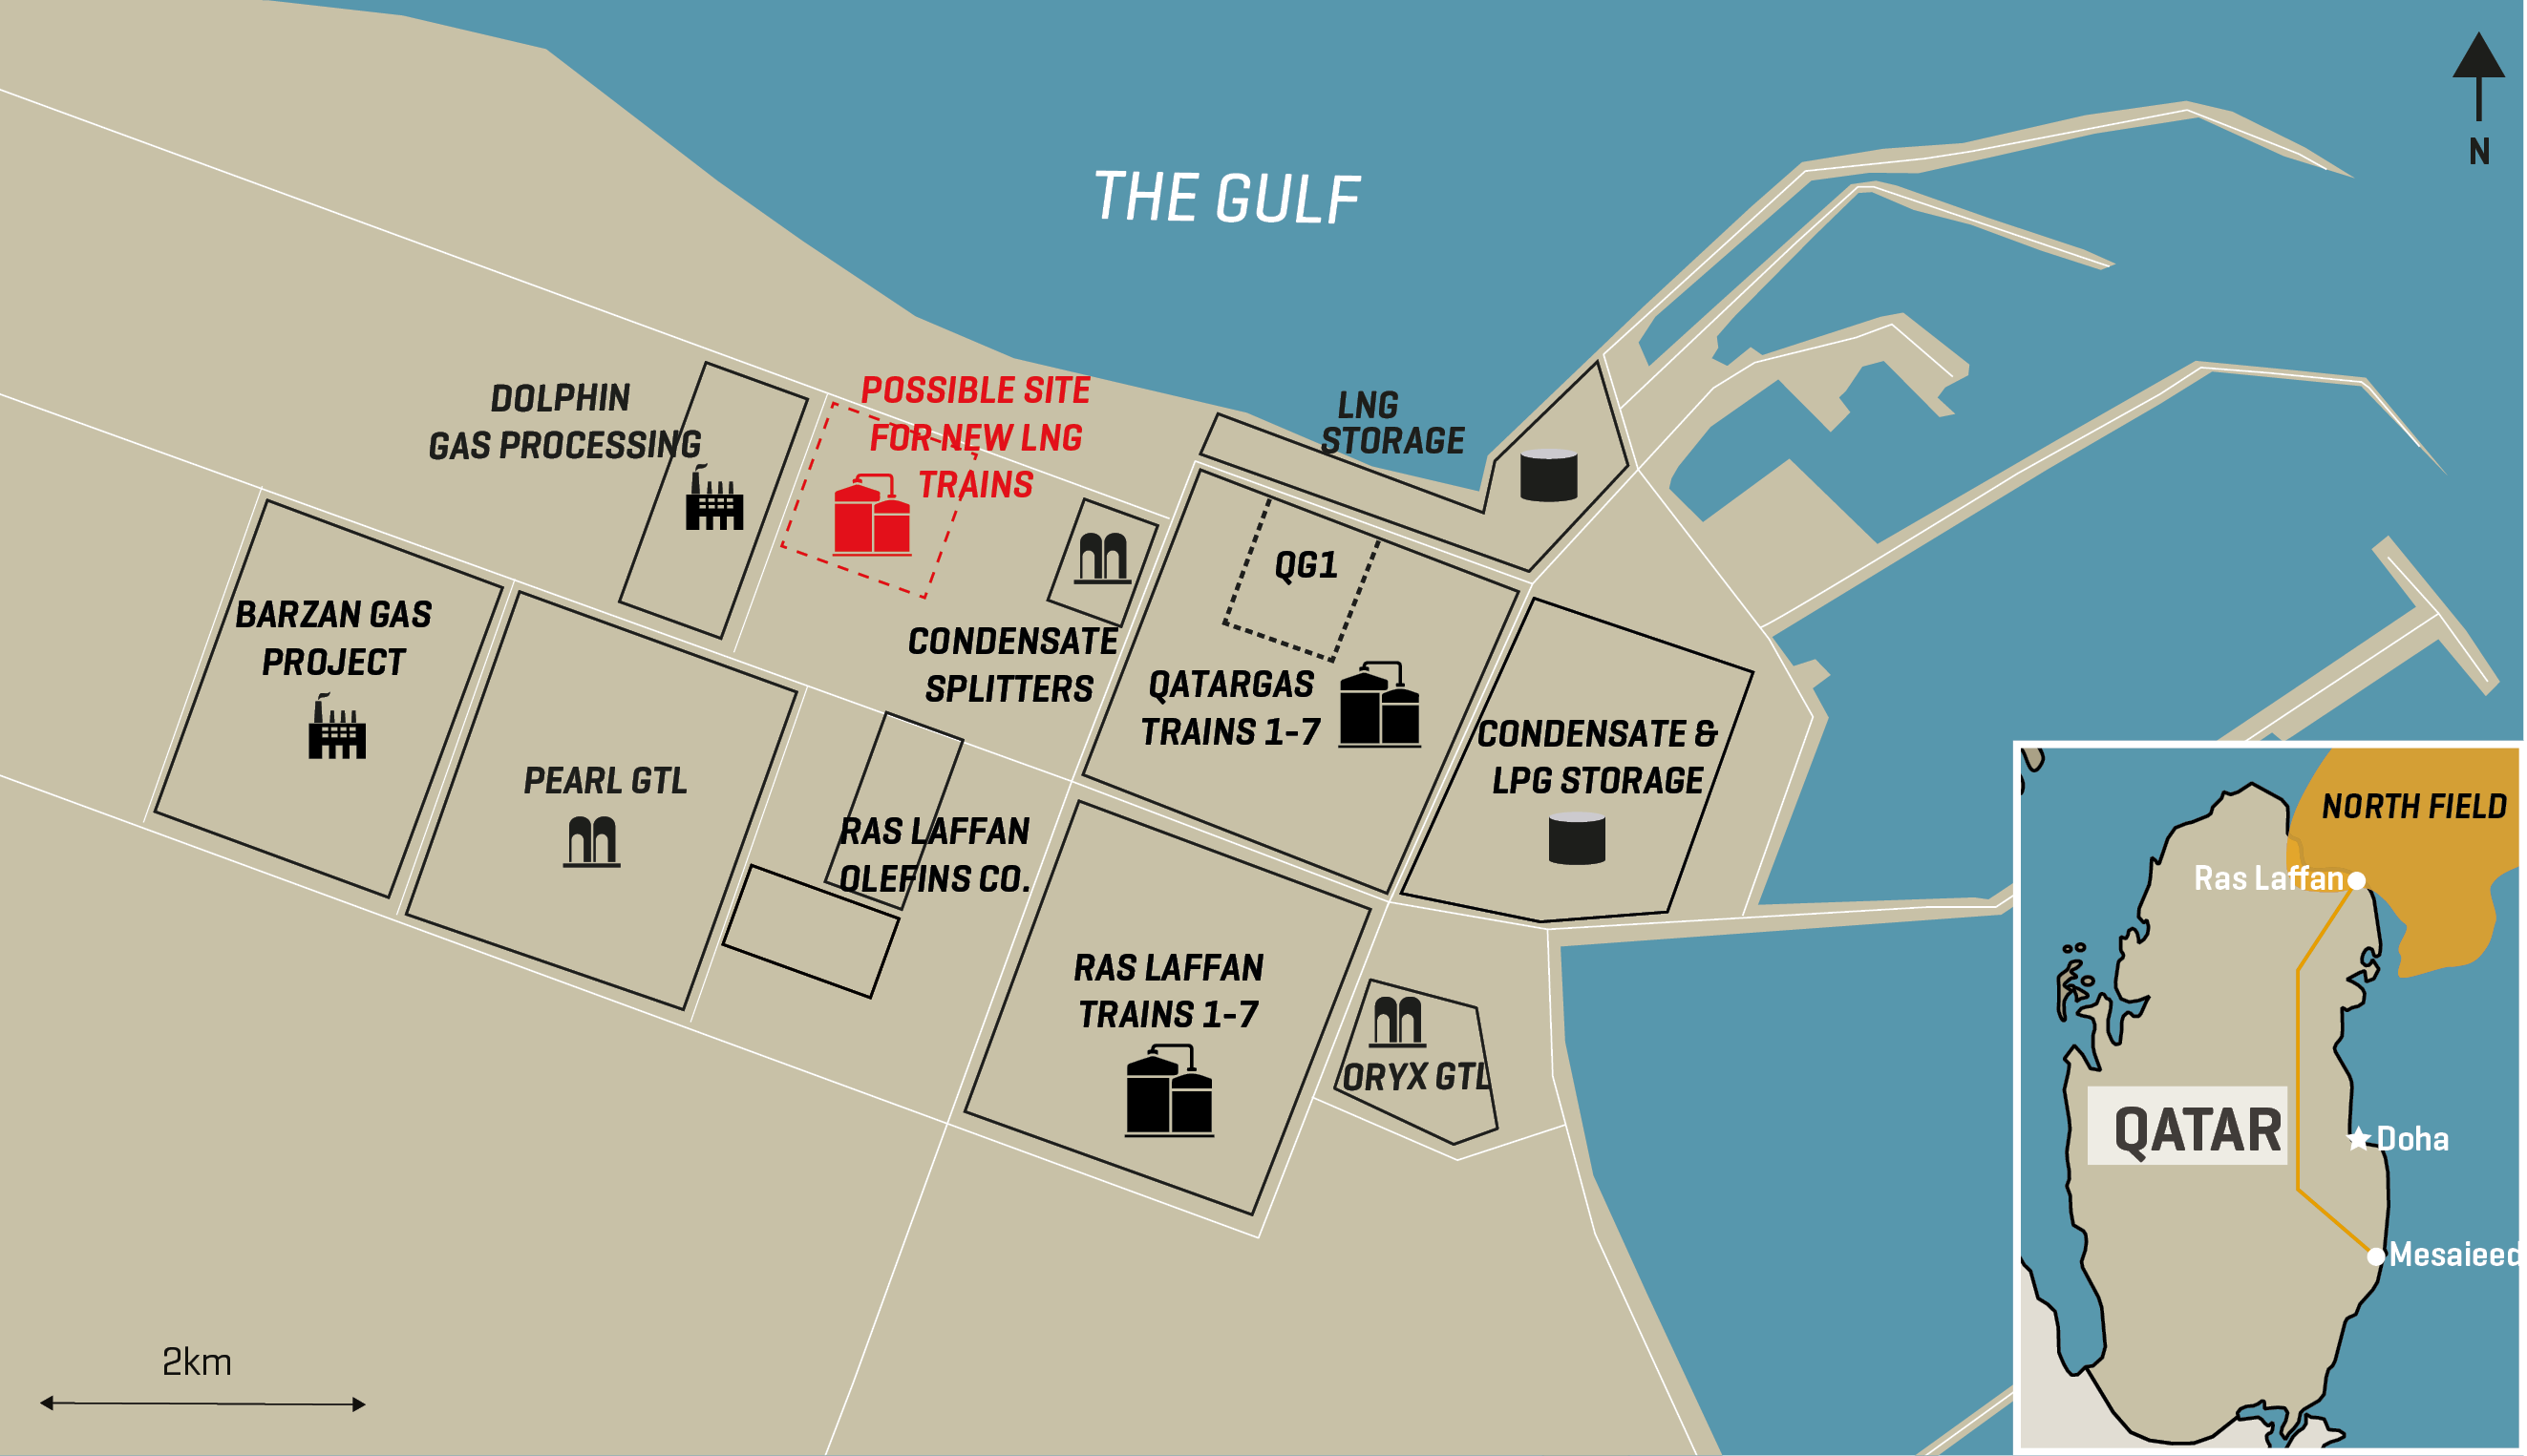 Qatar's Ras Laffan: Key Infrastructure